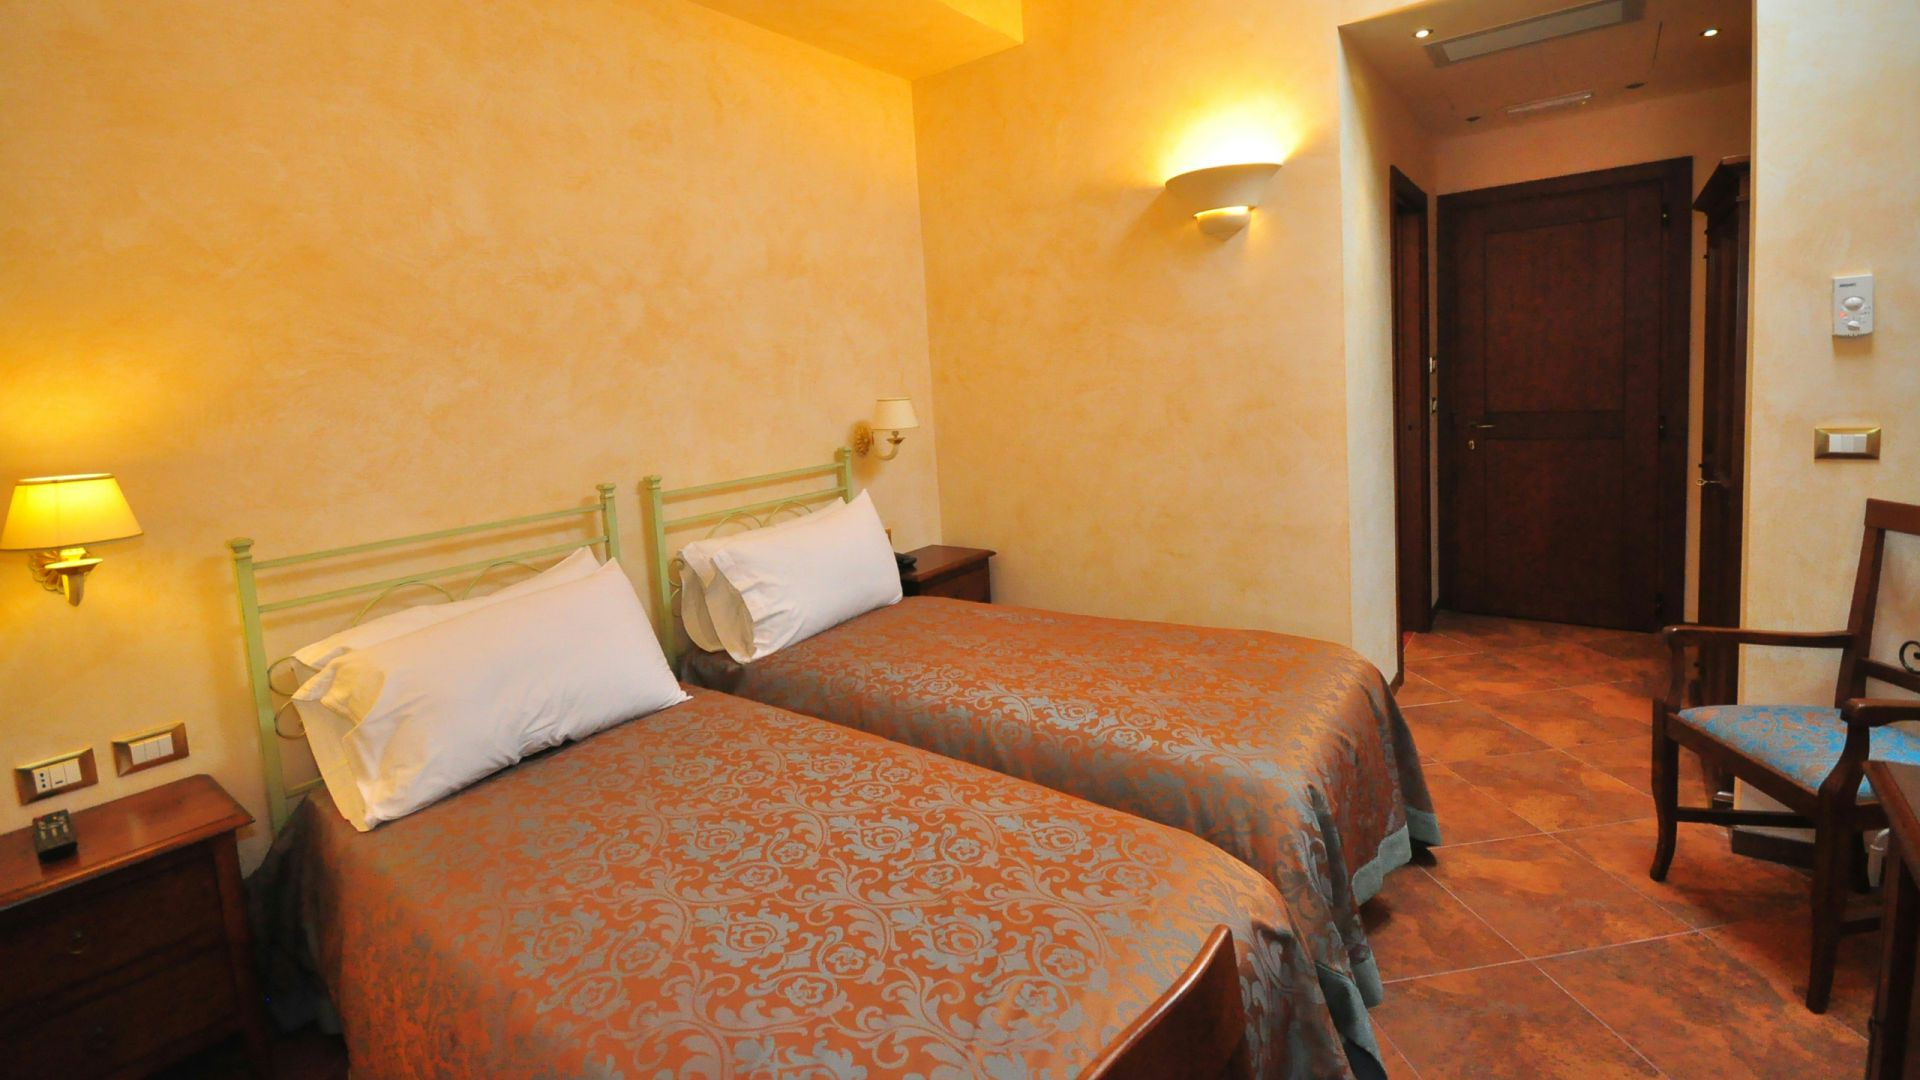 oc-casali-rome-rooms-12